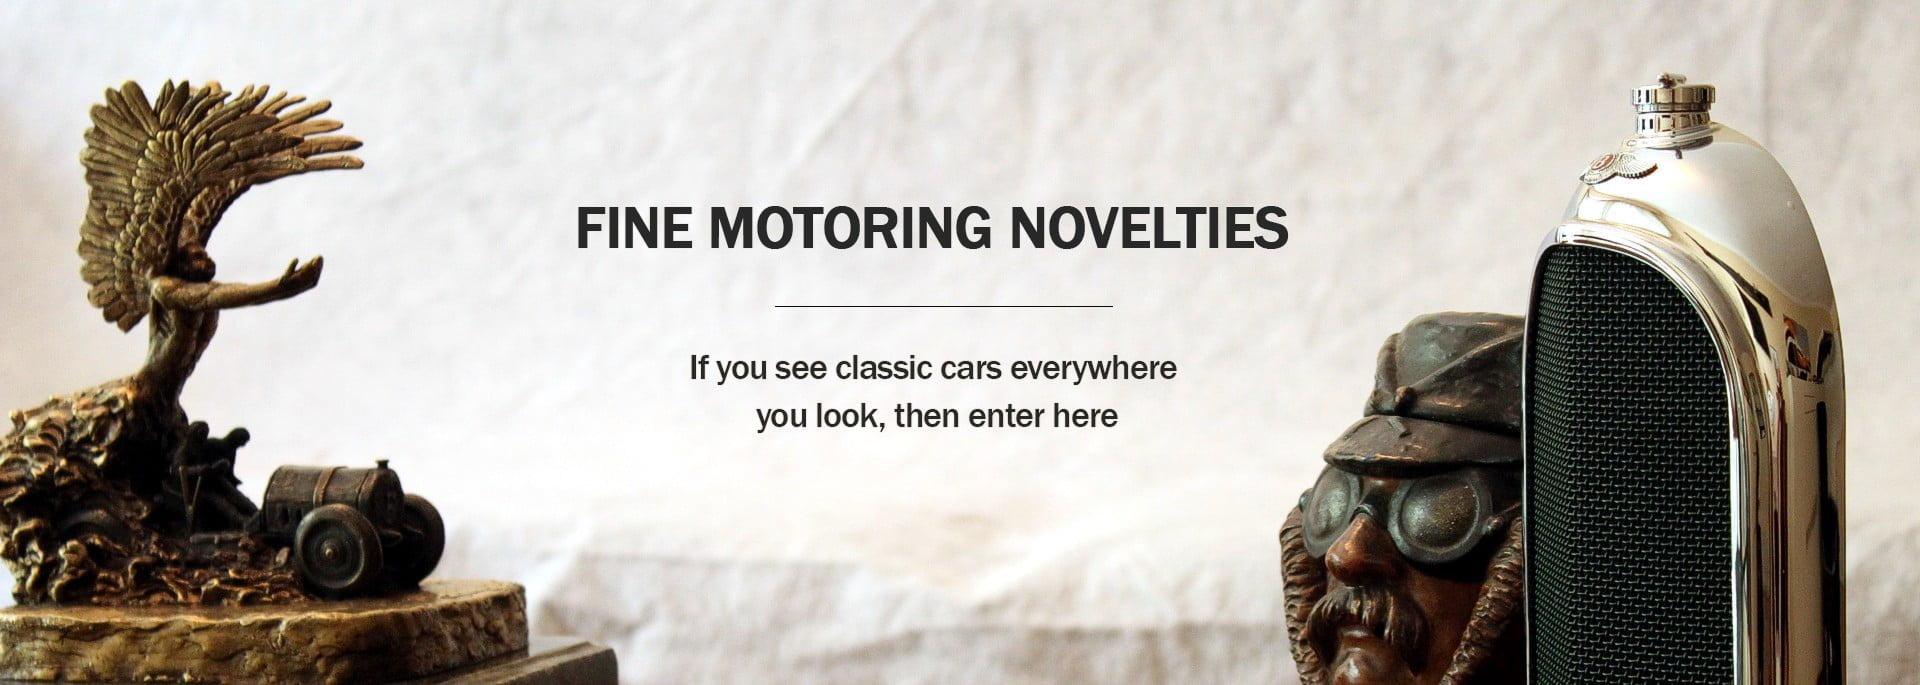 Fine Motoring Novelties